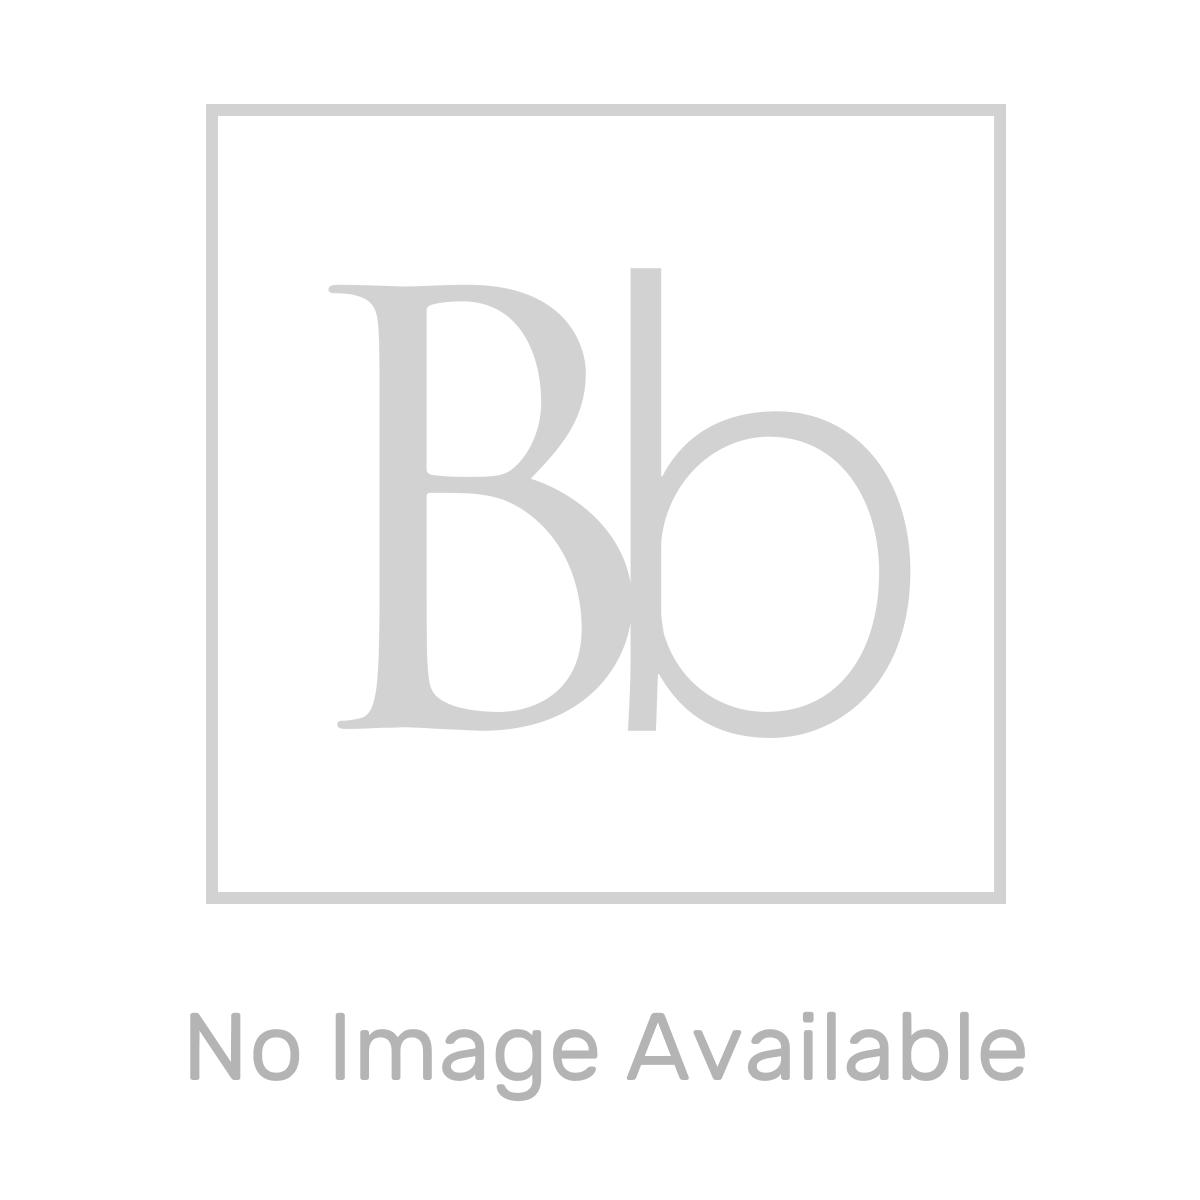 L Shaped Bath Screen Hinge Right Hand